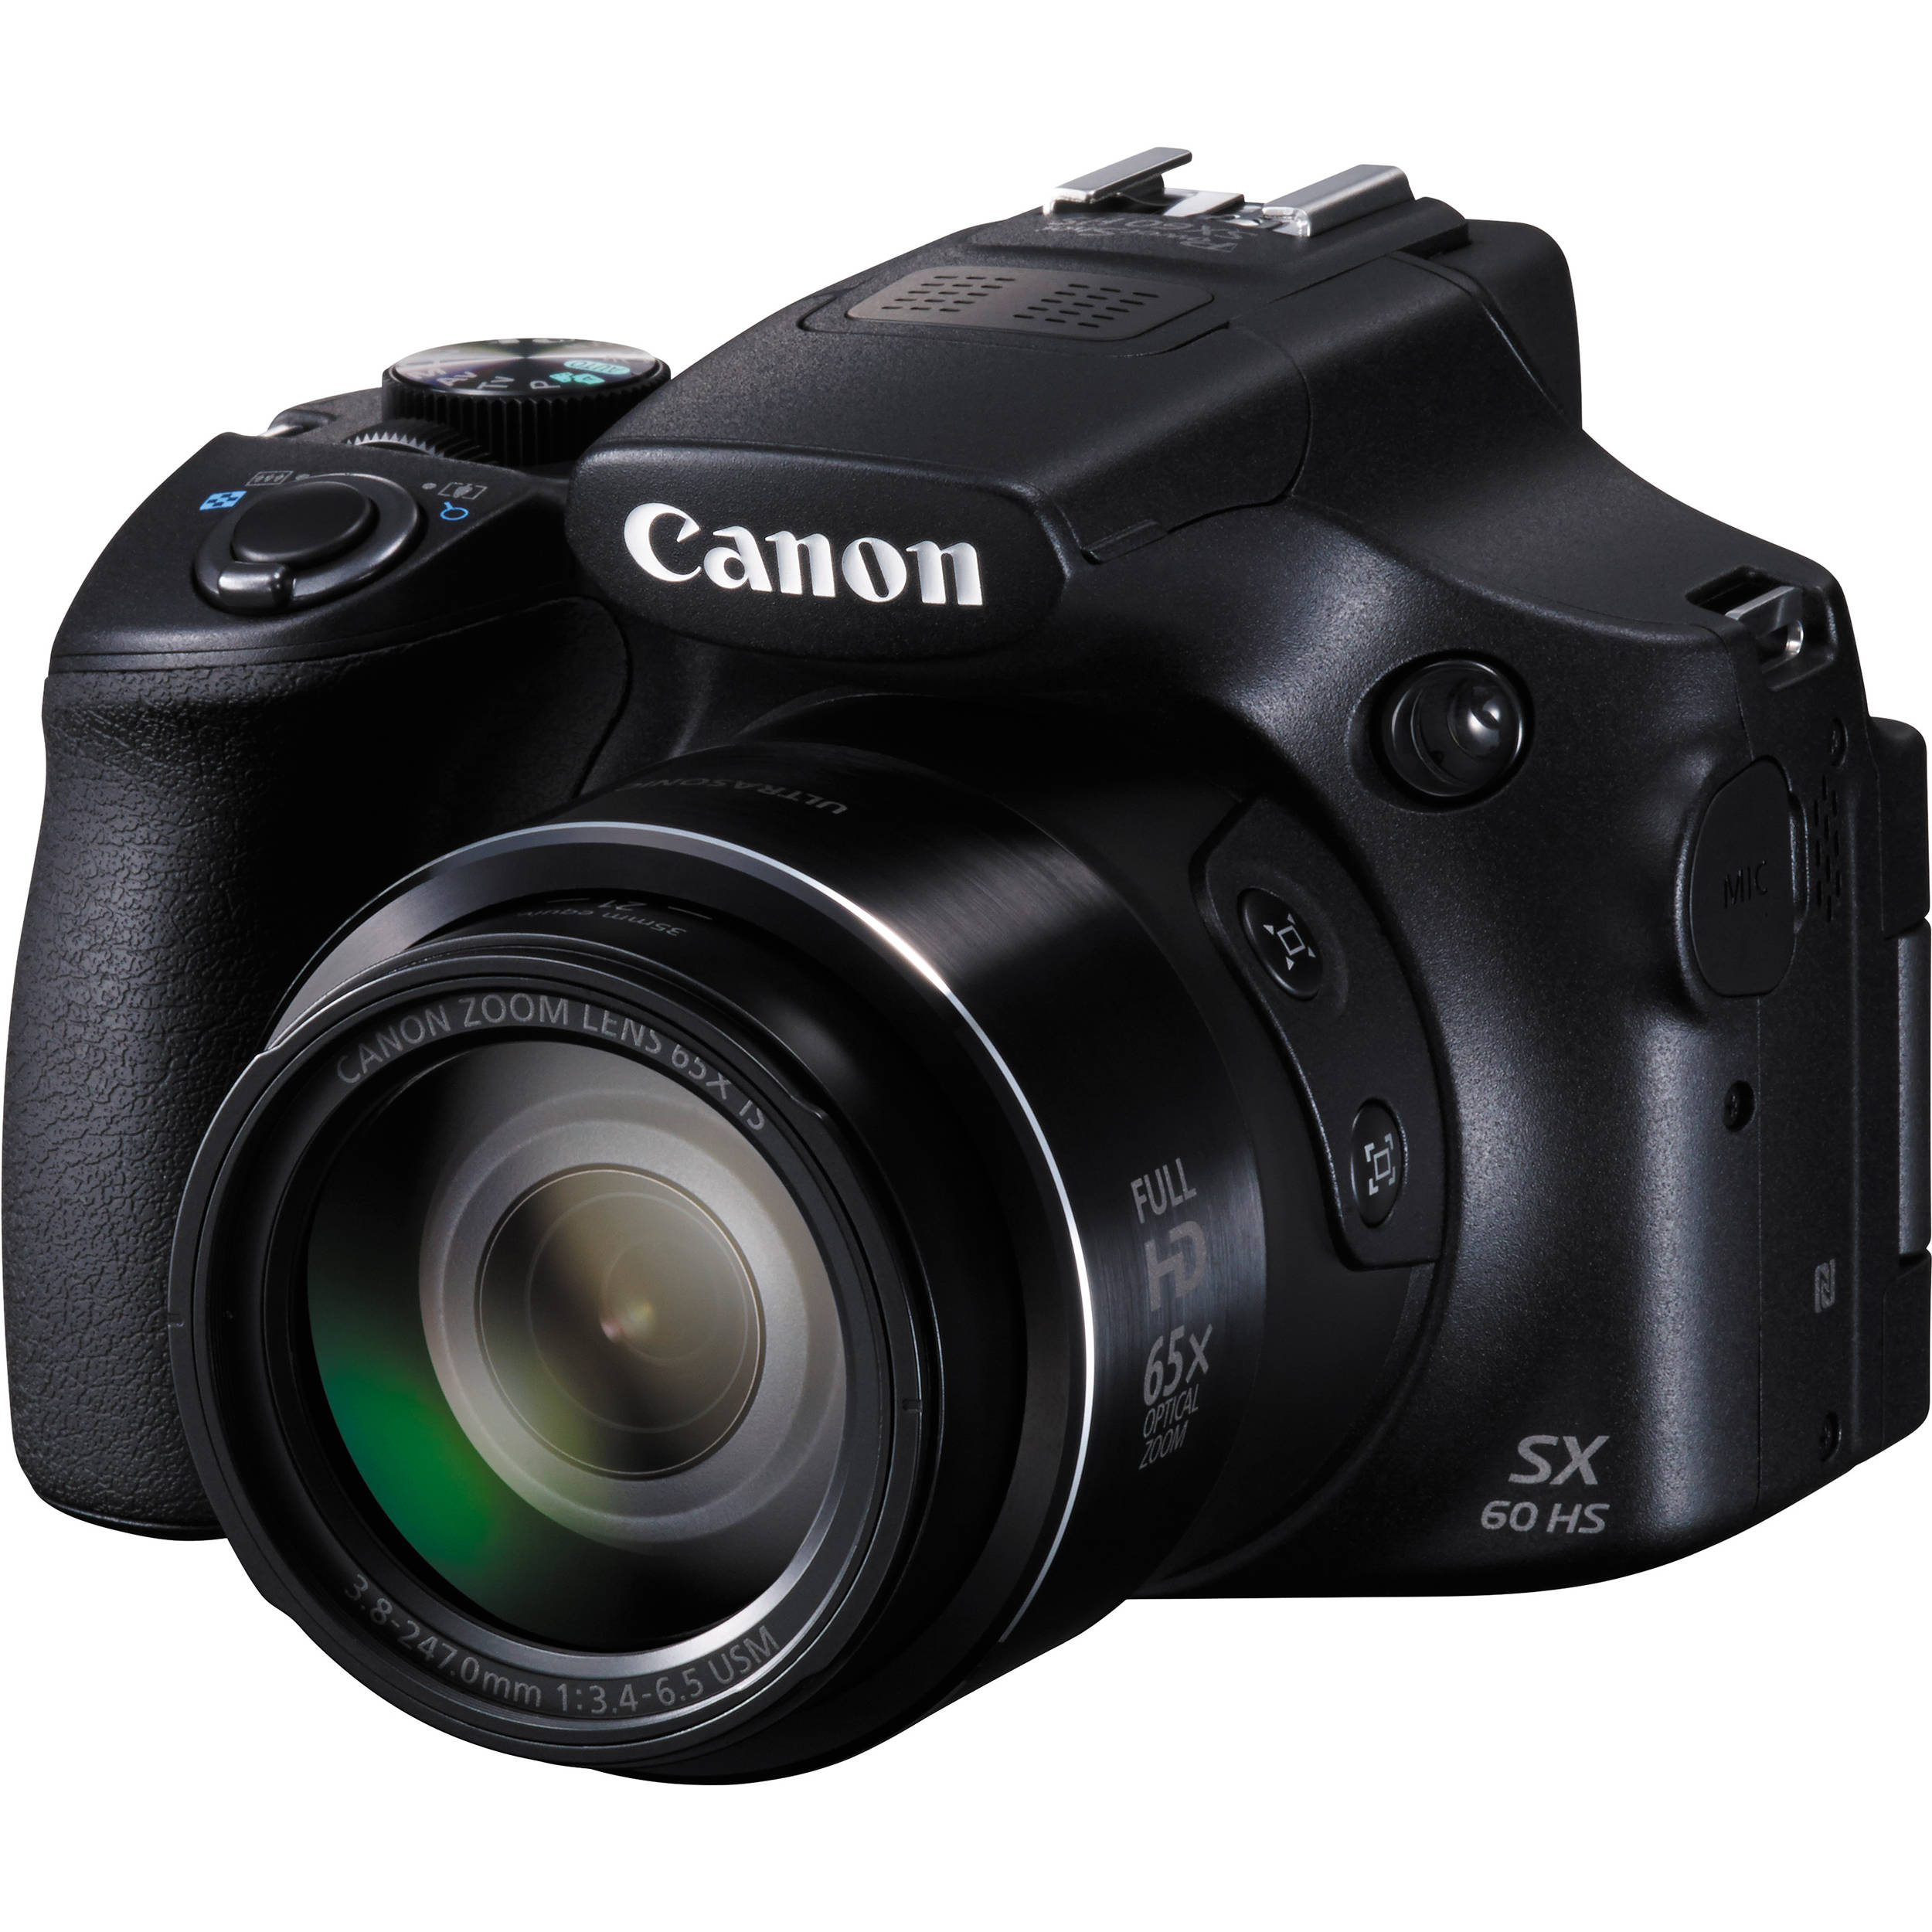 Canon powershot sx40 hs camera download instruction manual pdf.